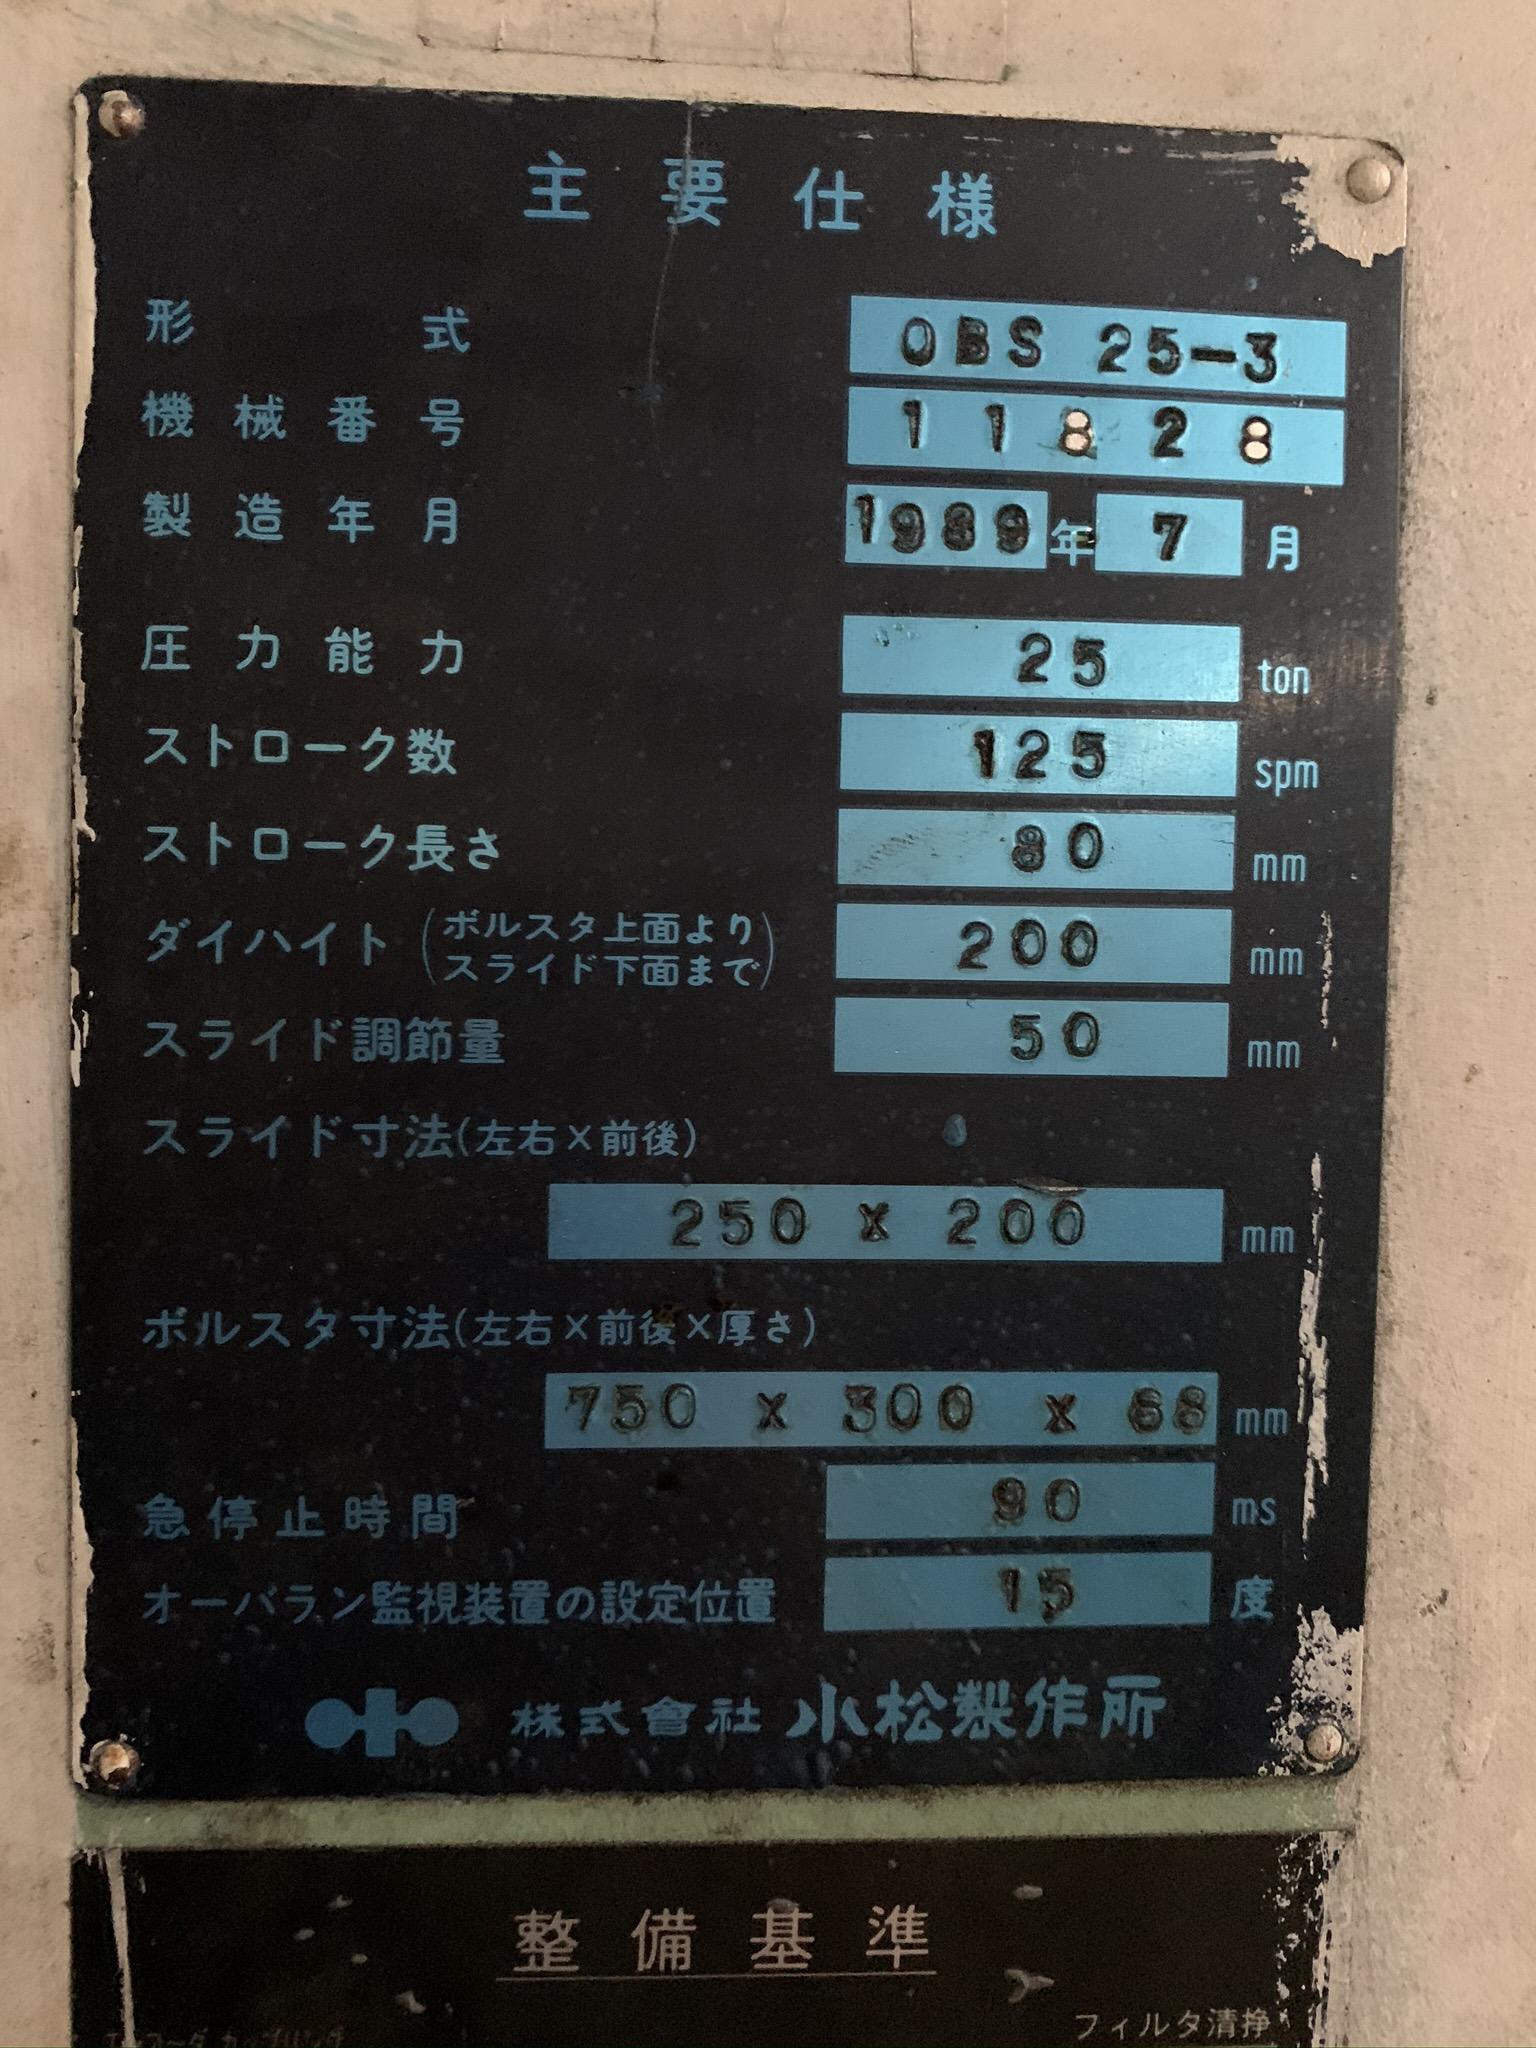 27.5 TON KOMATSU MODEL OBS-25-3 SINGLE POINT GAP FRAME PRESS; S/N 11828, SPM 125, STROKE LENGTH 3. - Image 7 of 9